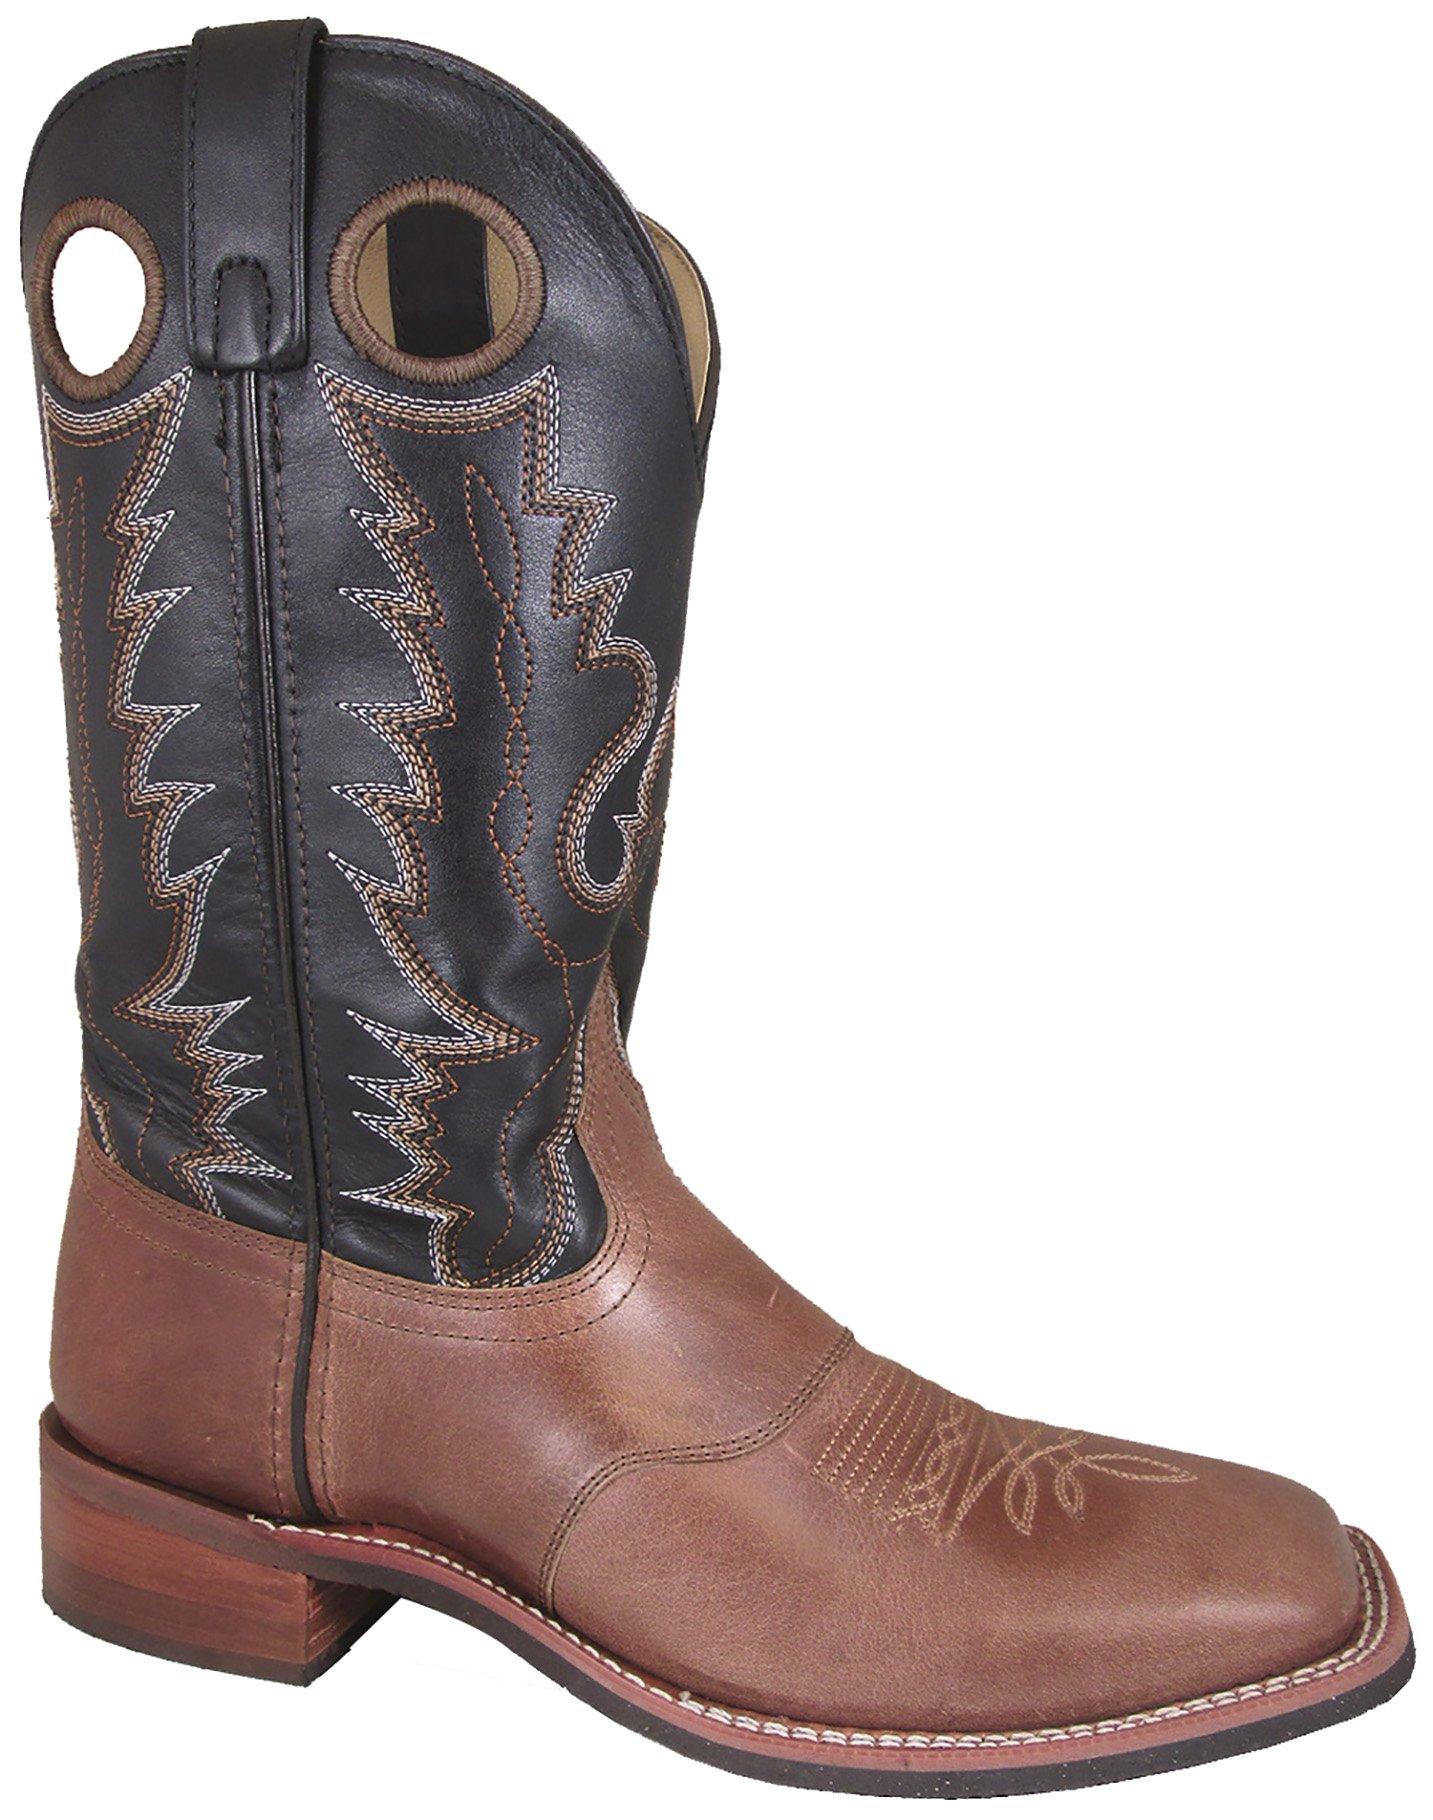 Smoky Mountain Mens Tan/Black Ryan Square Toe Western Cowboy Boot by Smoky Mountain Boots